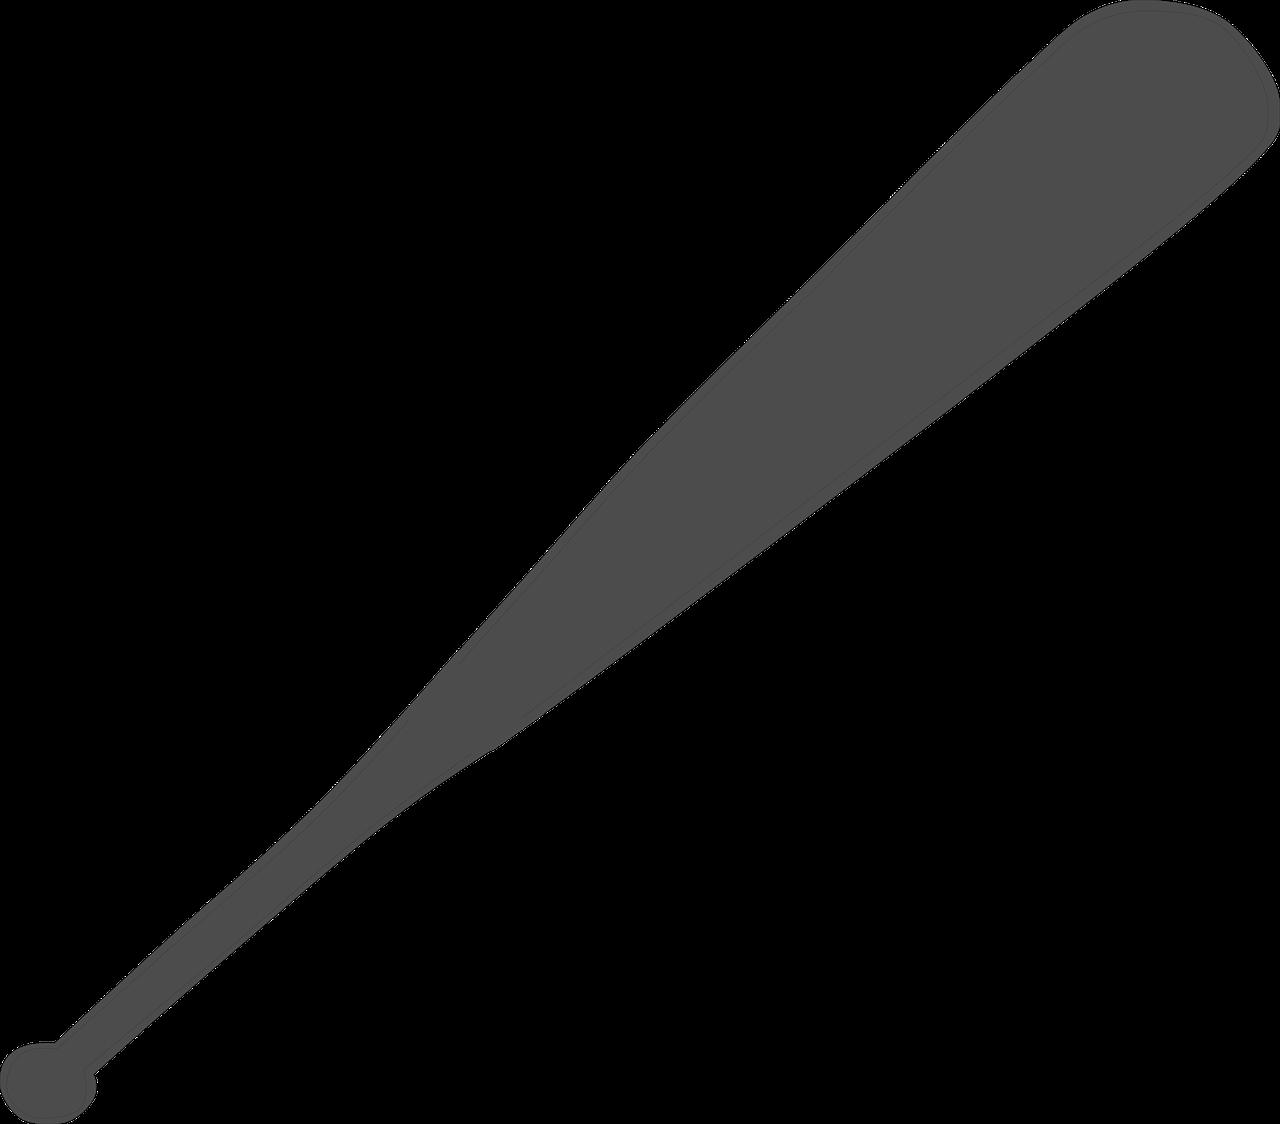 Top Softball Bat Clip Art Library » Free Vector Art, Images.